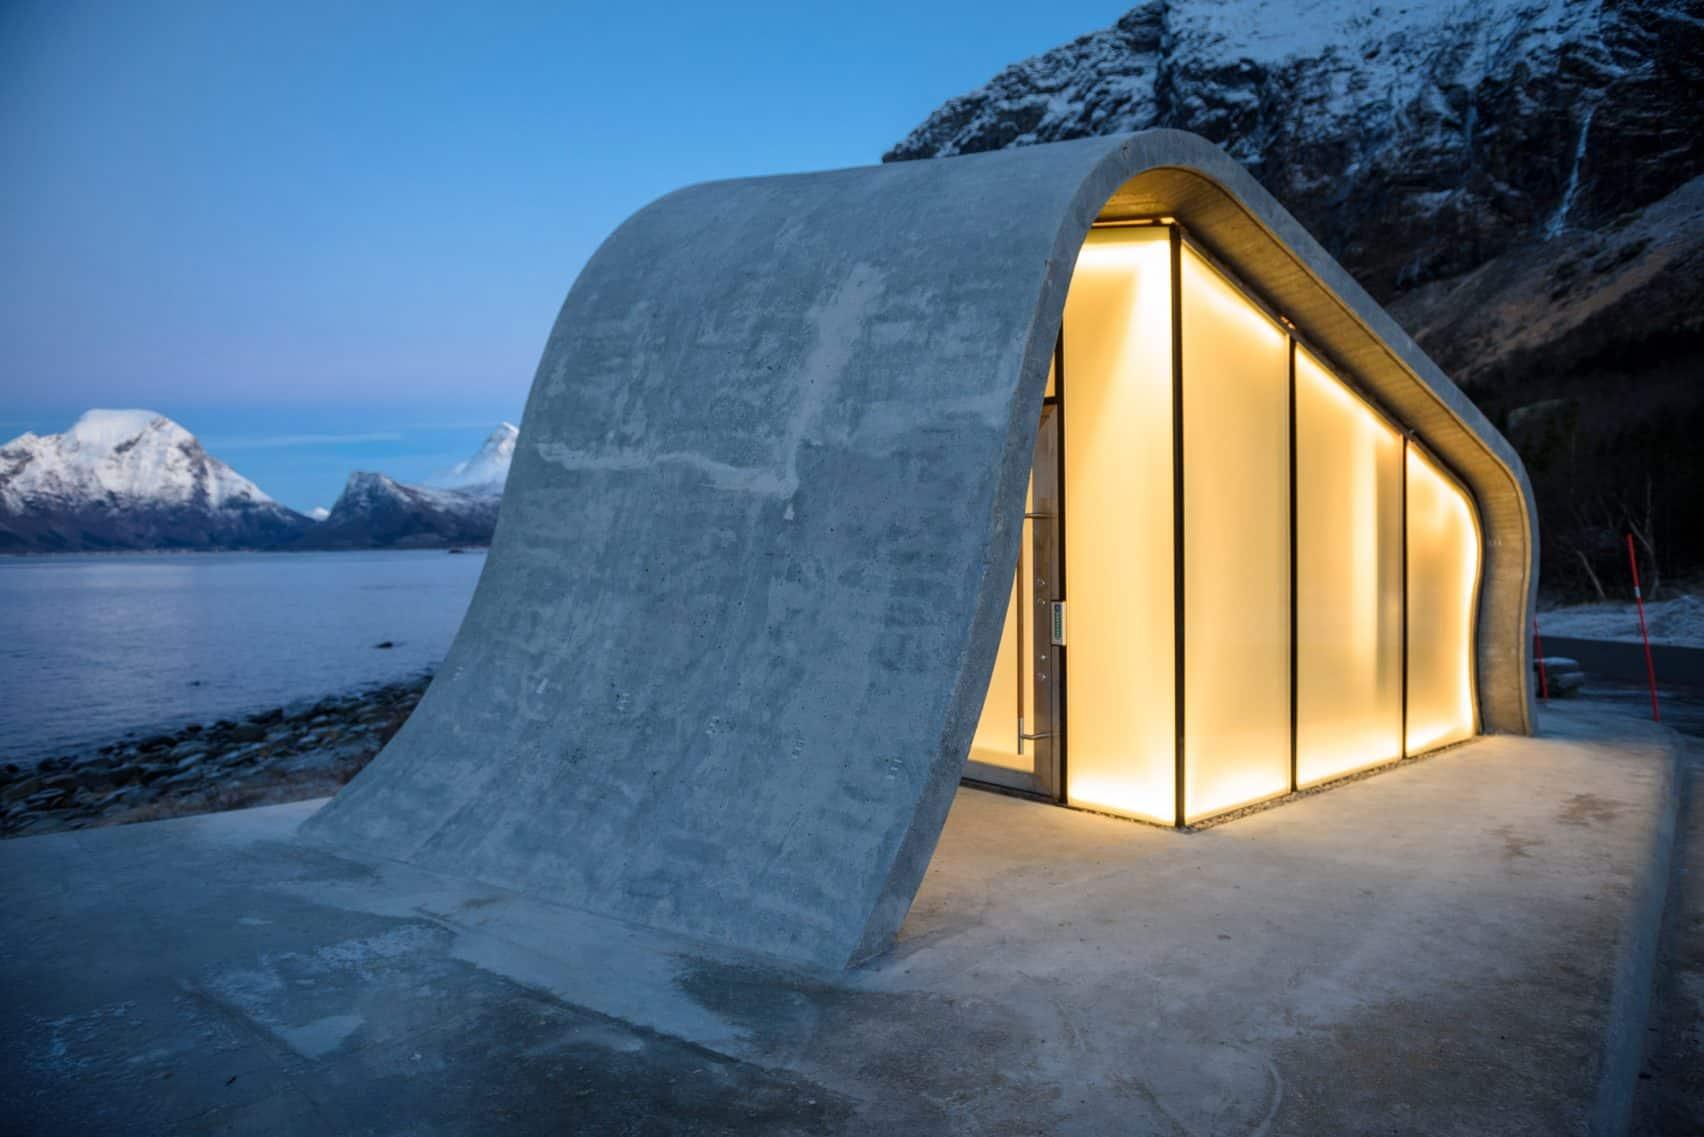 haugen zohar arkitekter hza wave shaped toilet facility norwegian scenic route 13